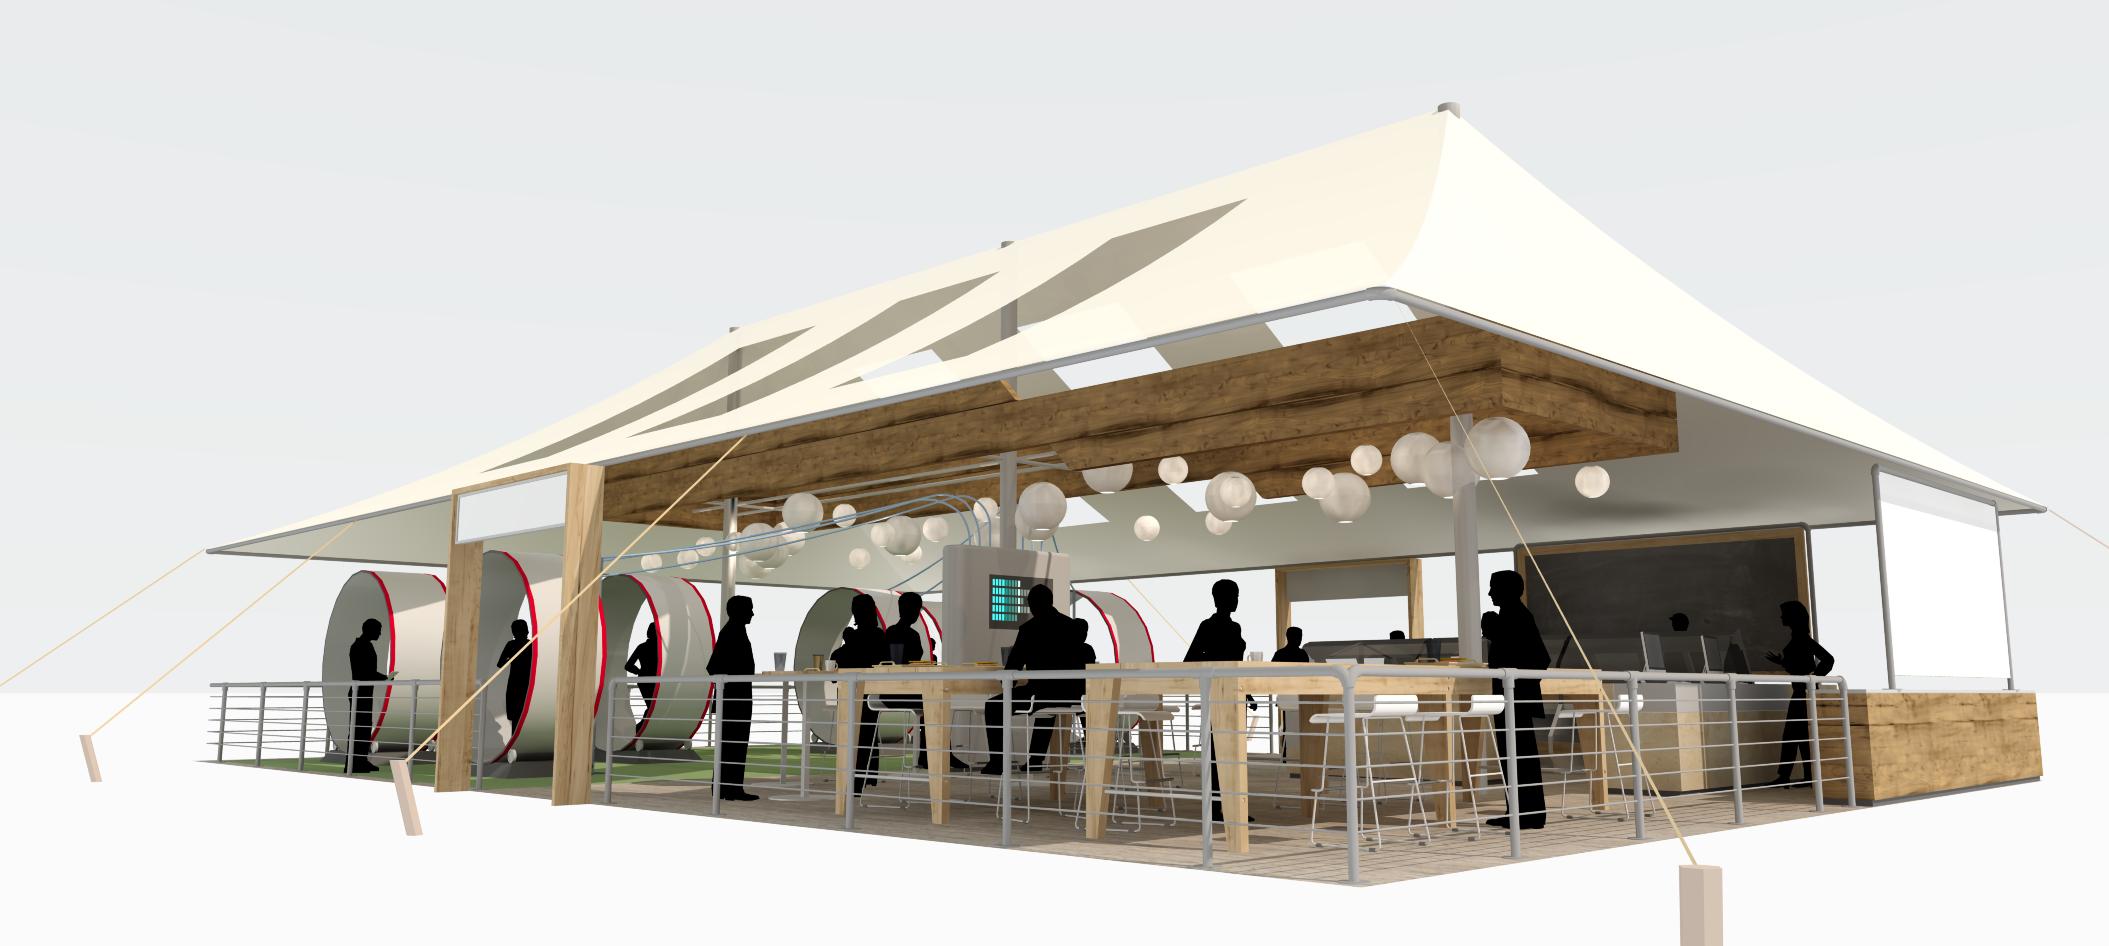 Safeway Tent. Sam Bowman Design.